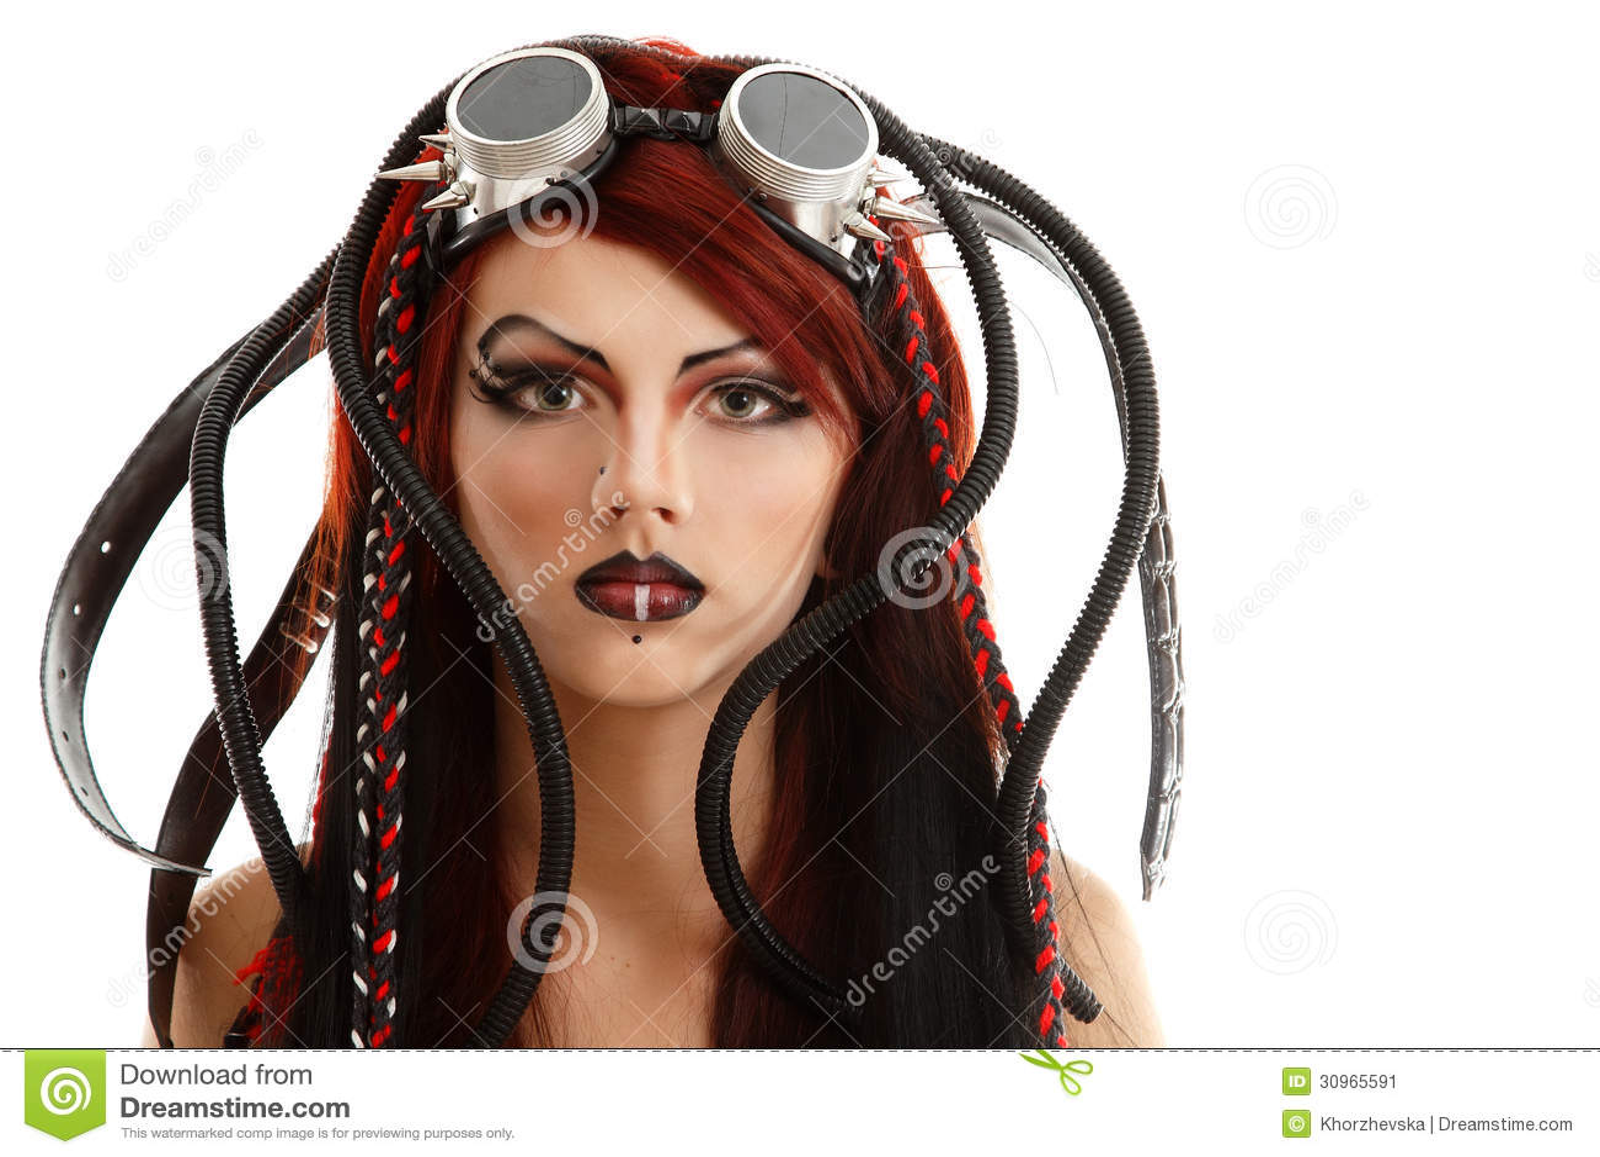 Teen girl hard depression informal ciber punk lonely isolated on - teen-girl-hard-depression-informal-ciber-punk-lonely-isolated-blank-expressions-white-background-30965591